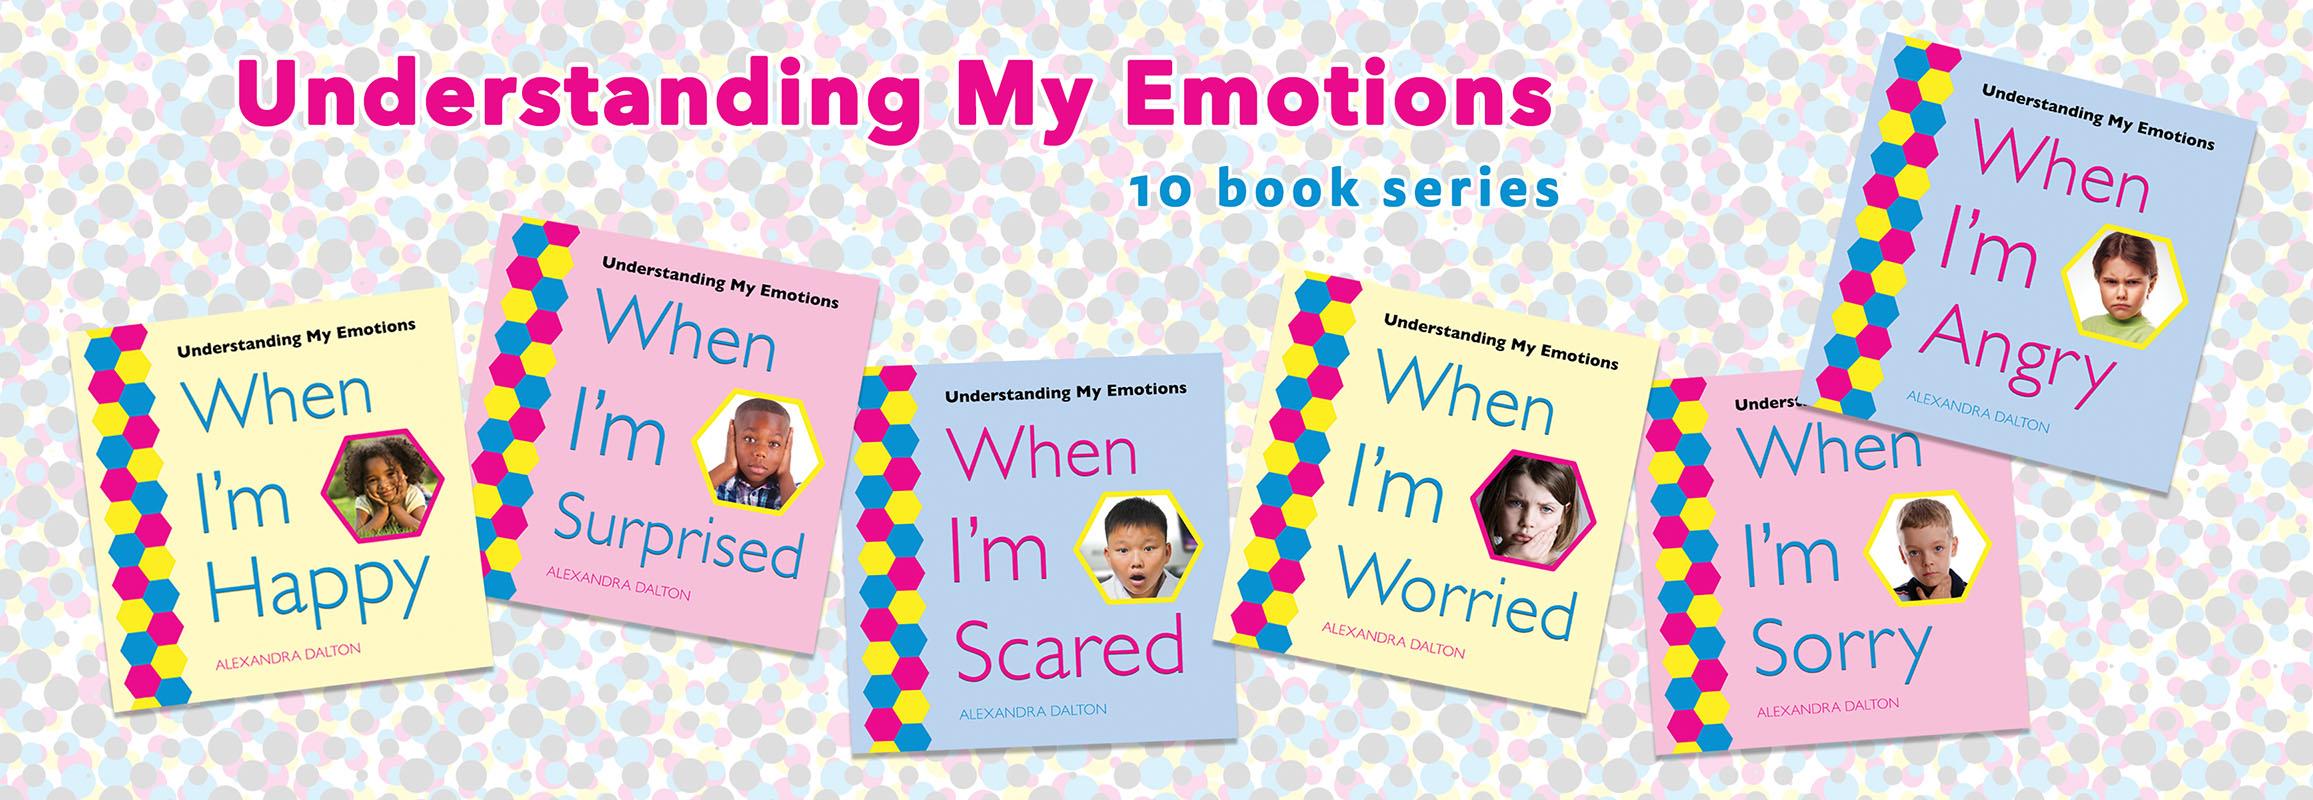 emotions banner.jpg